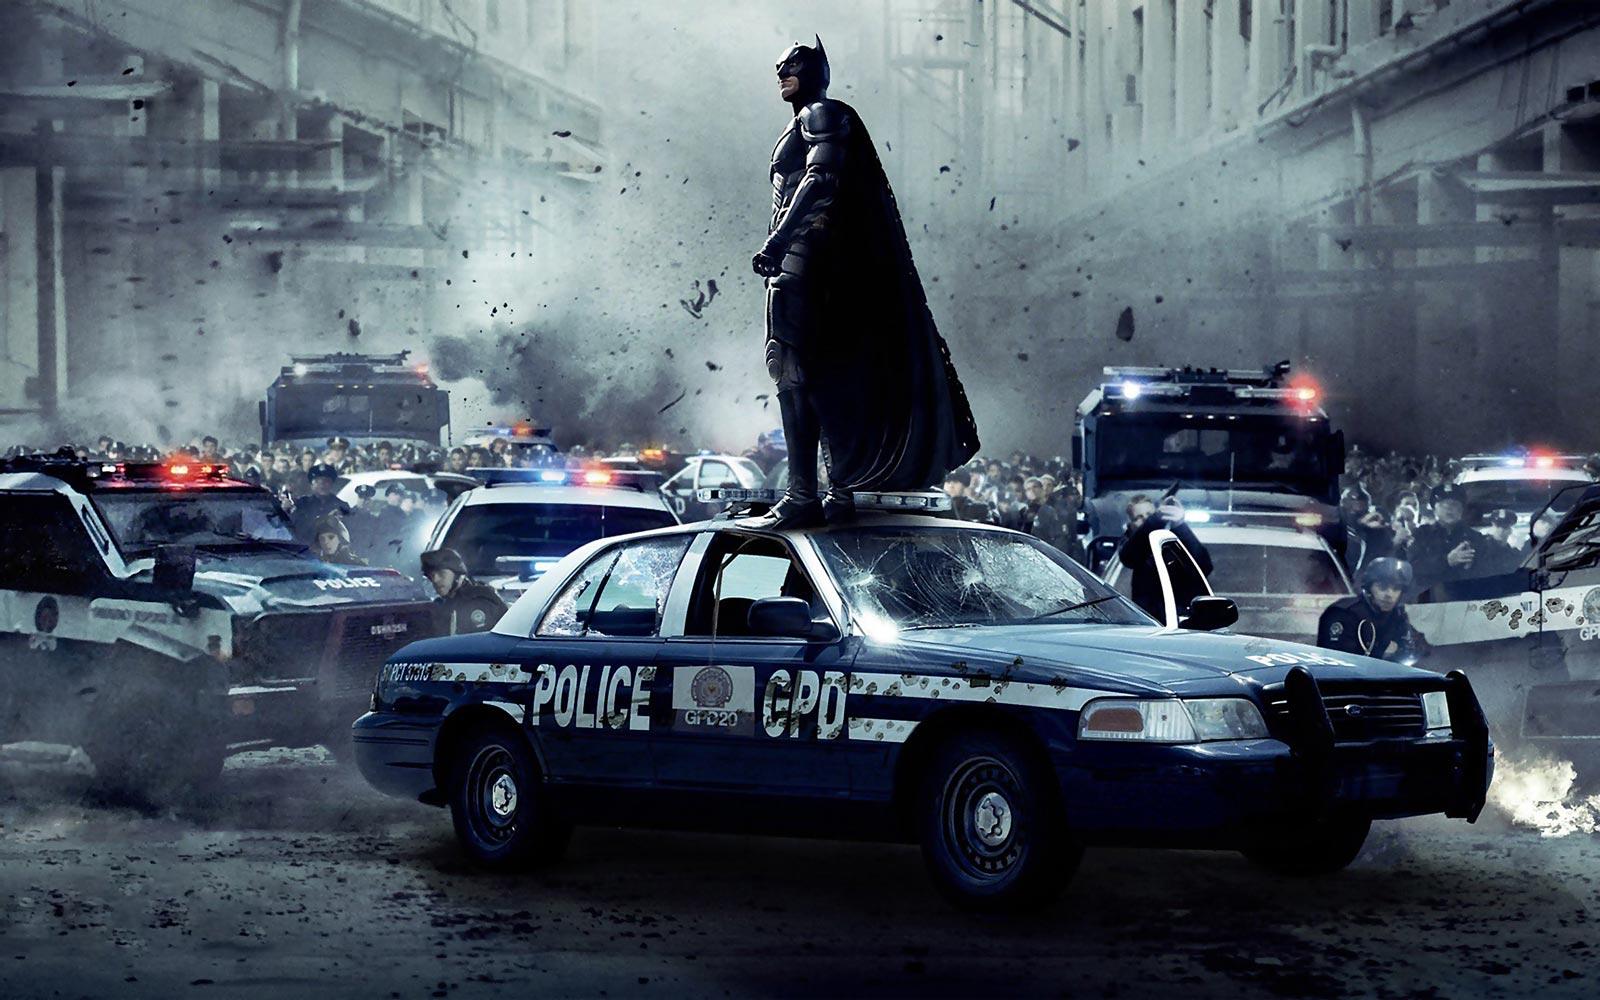 Image tirée du film The Dark Knight Rises (Photo : Warner Bros).